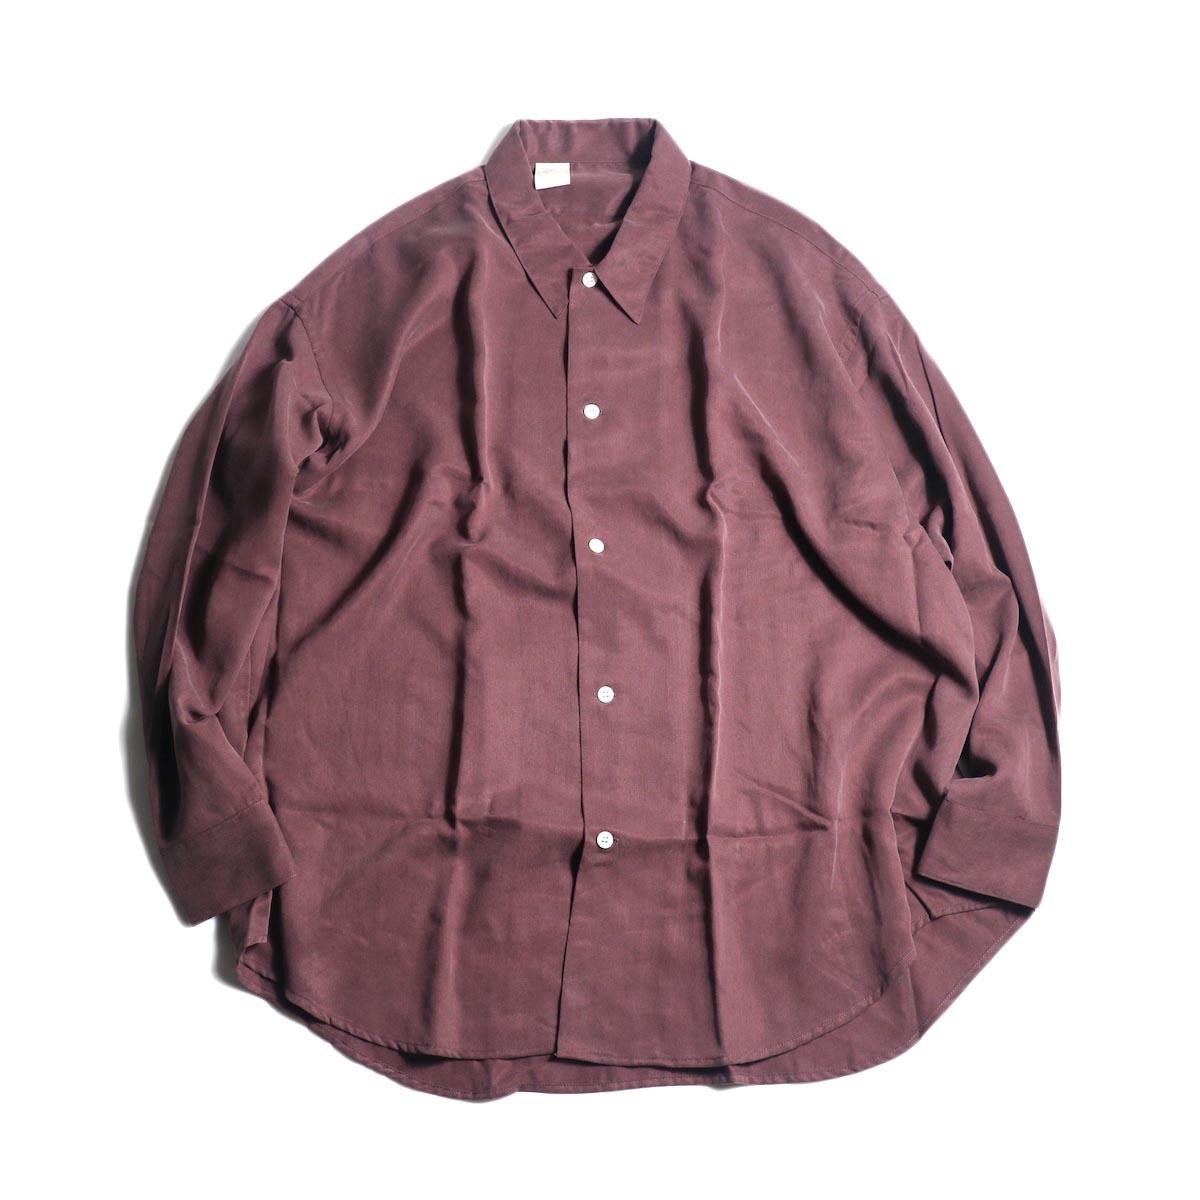 N.HOOLYWOOD / 1202-SH07-037 Loose Shirt (Burgundy)正面